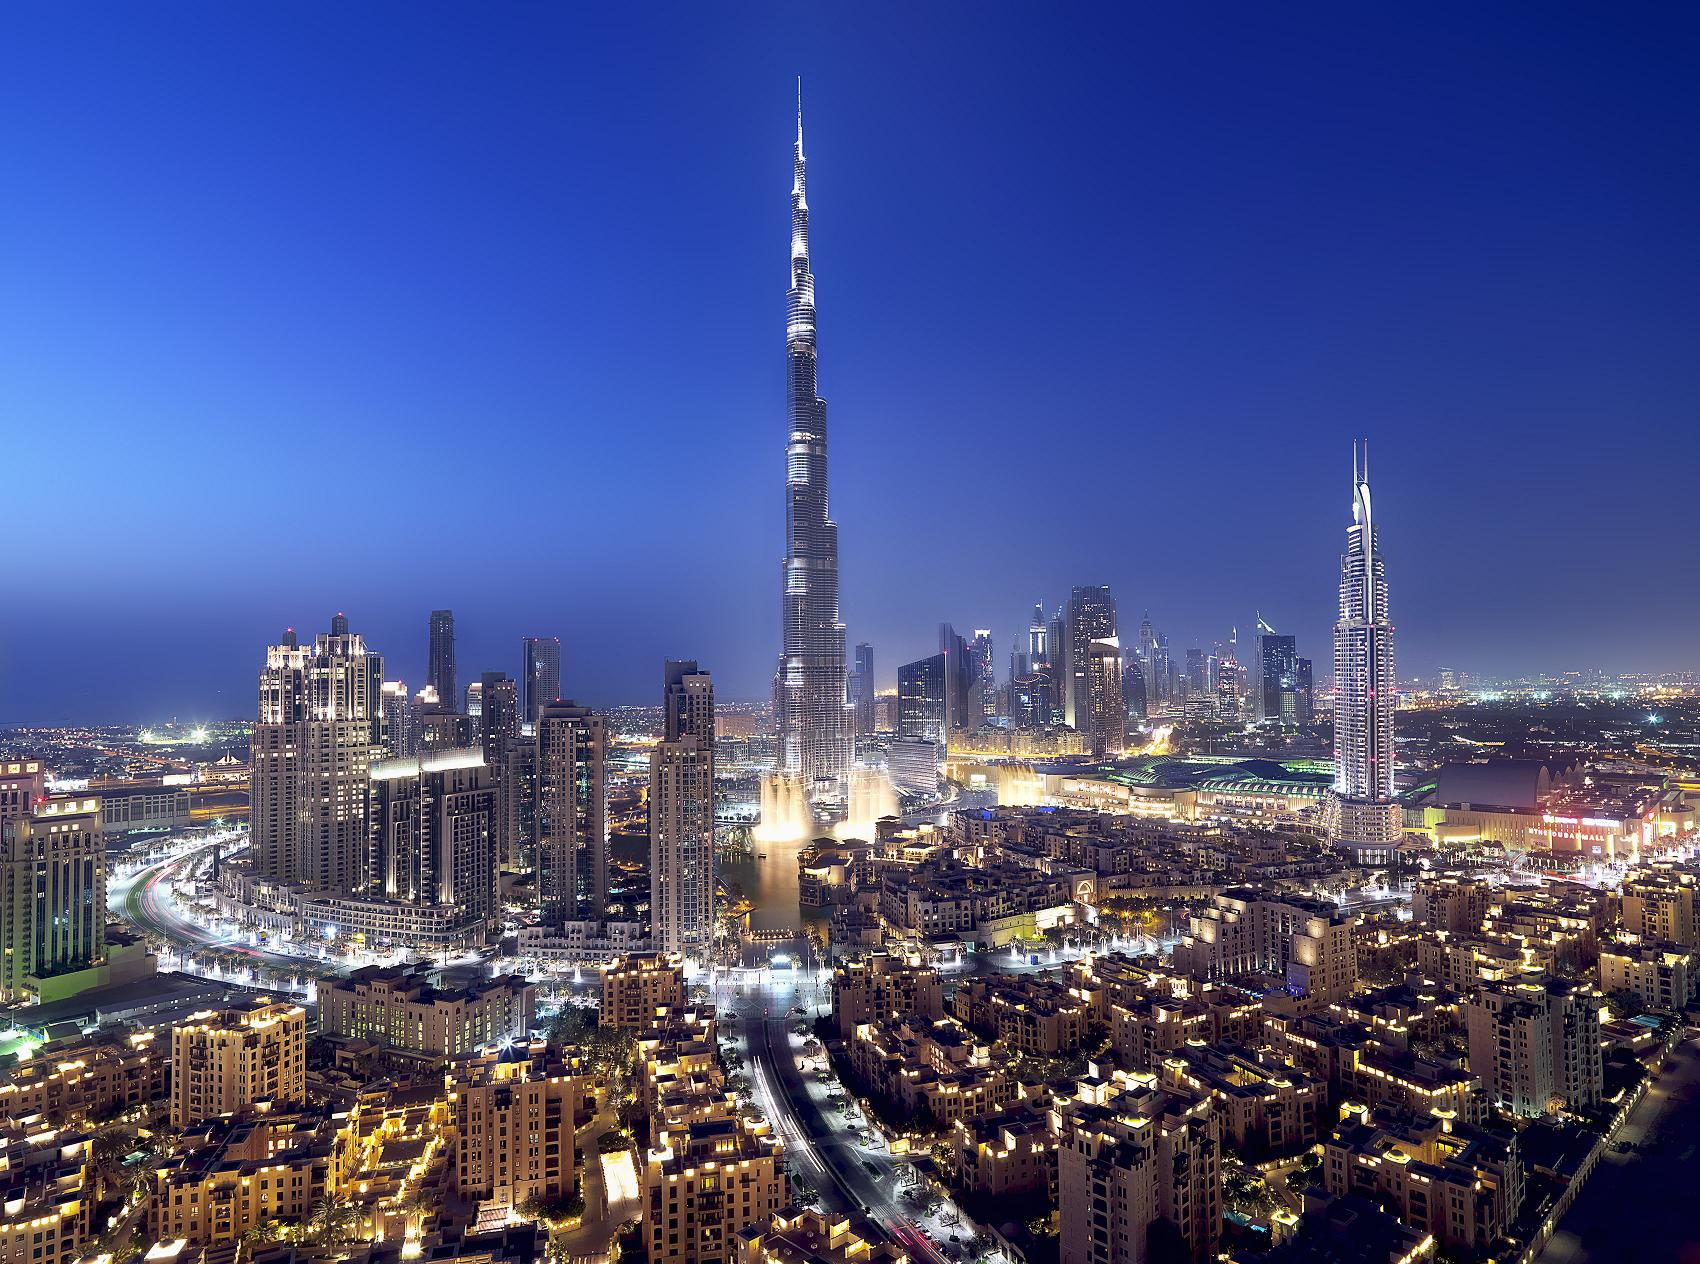 Best-selling author, Dr. Parag Khanna, hails Dubai as the centre of new world order.  Image Credit: Courtesy: Dubai Media Office